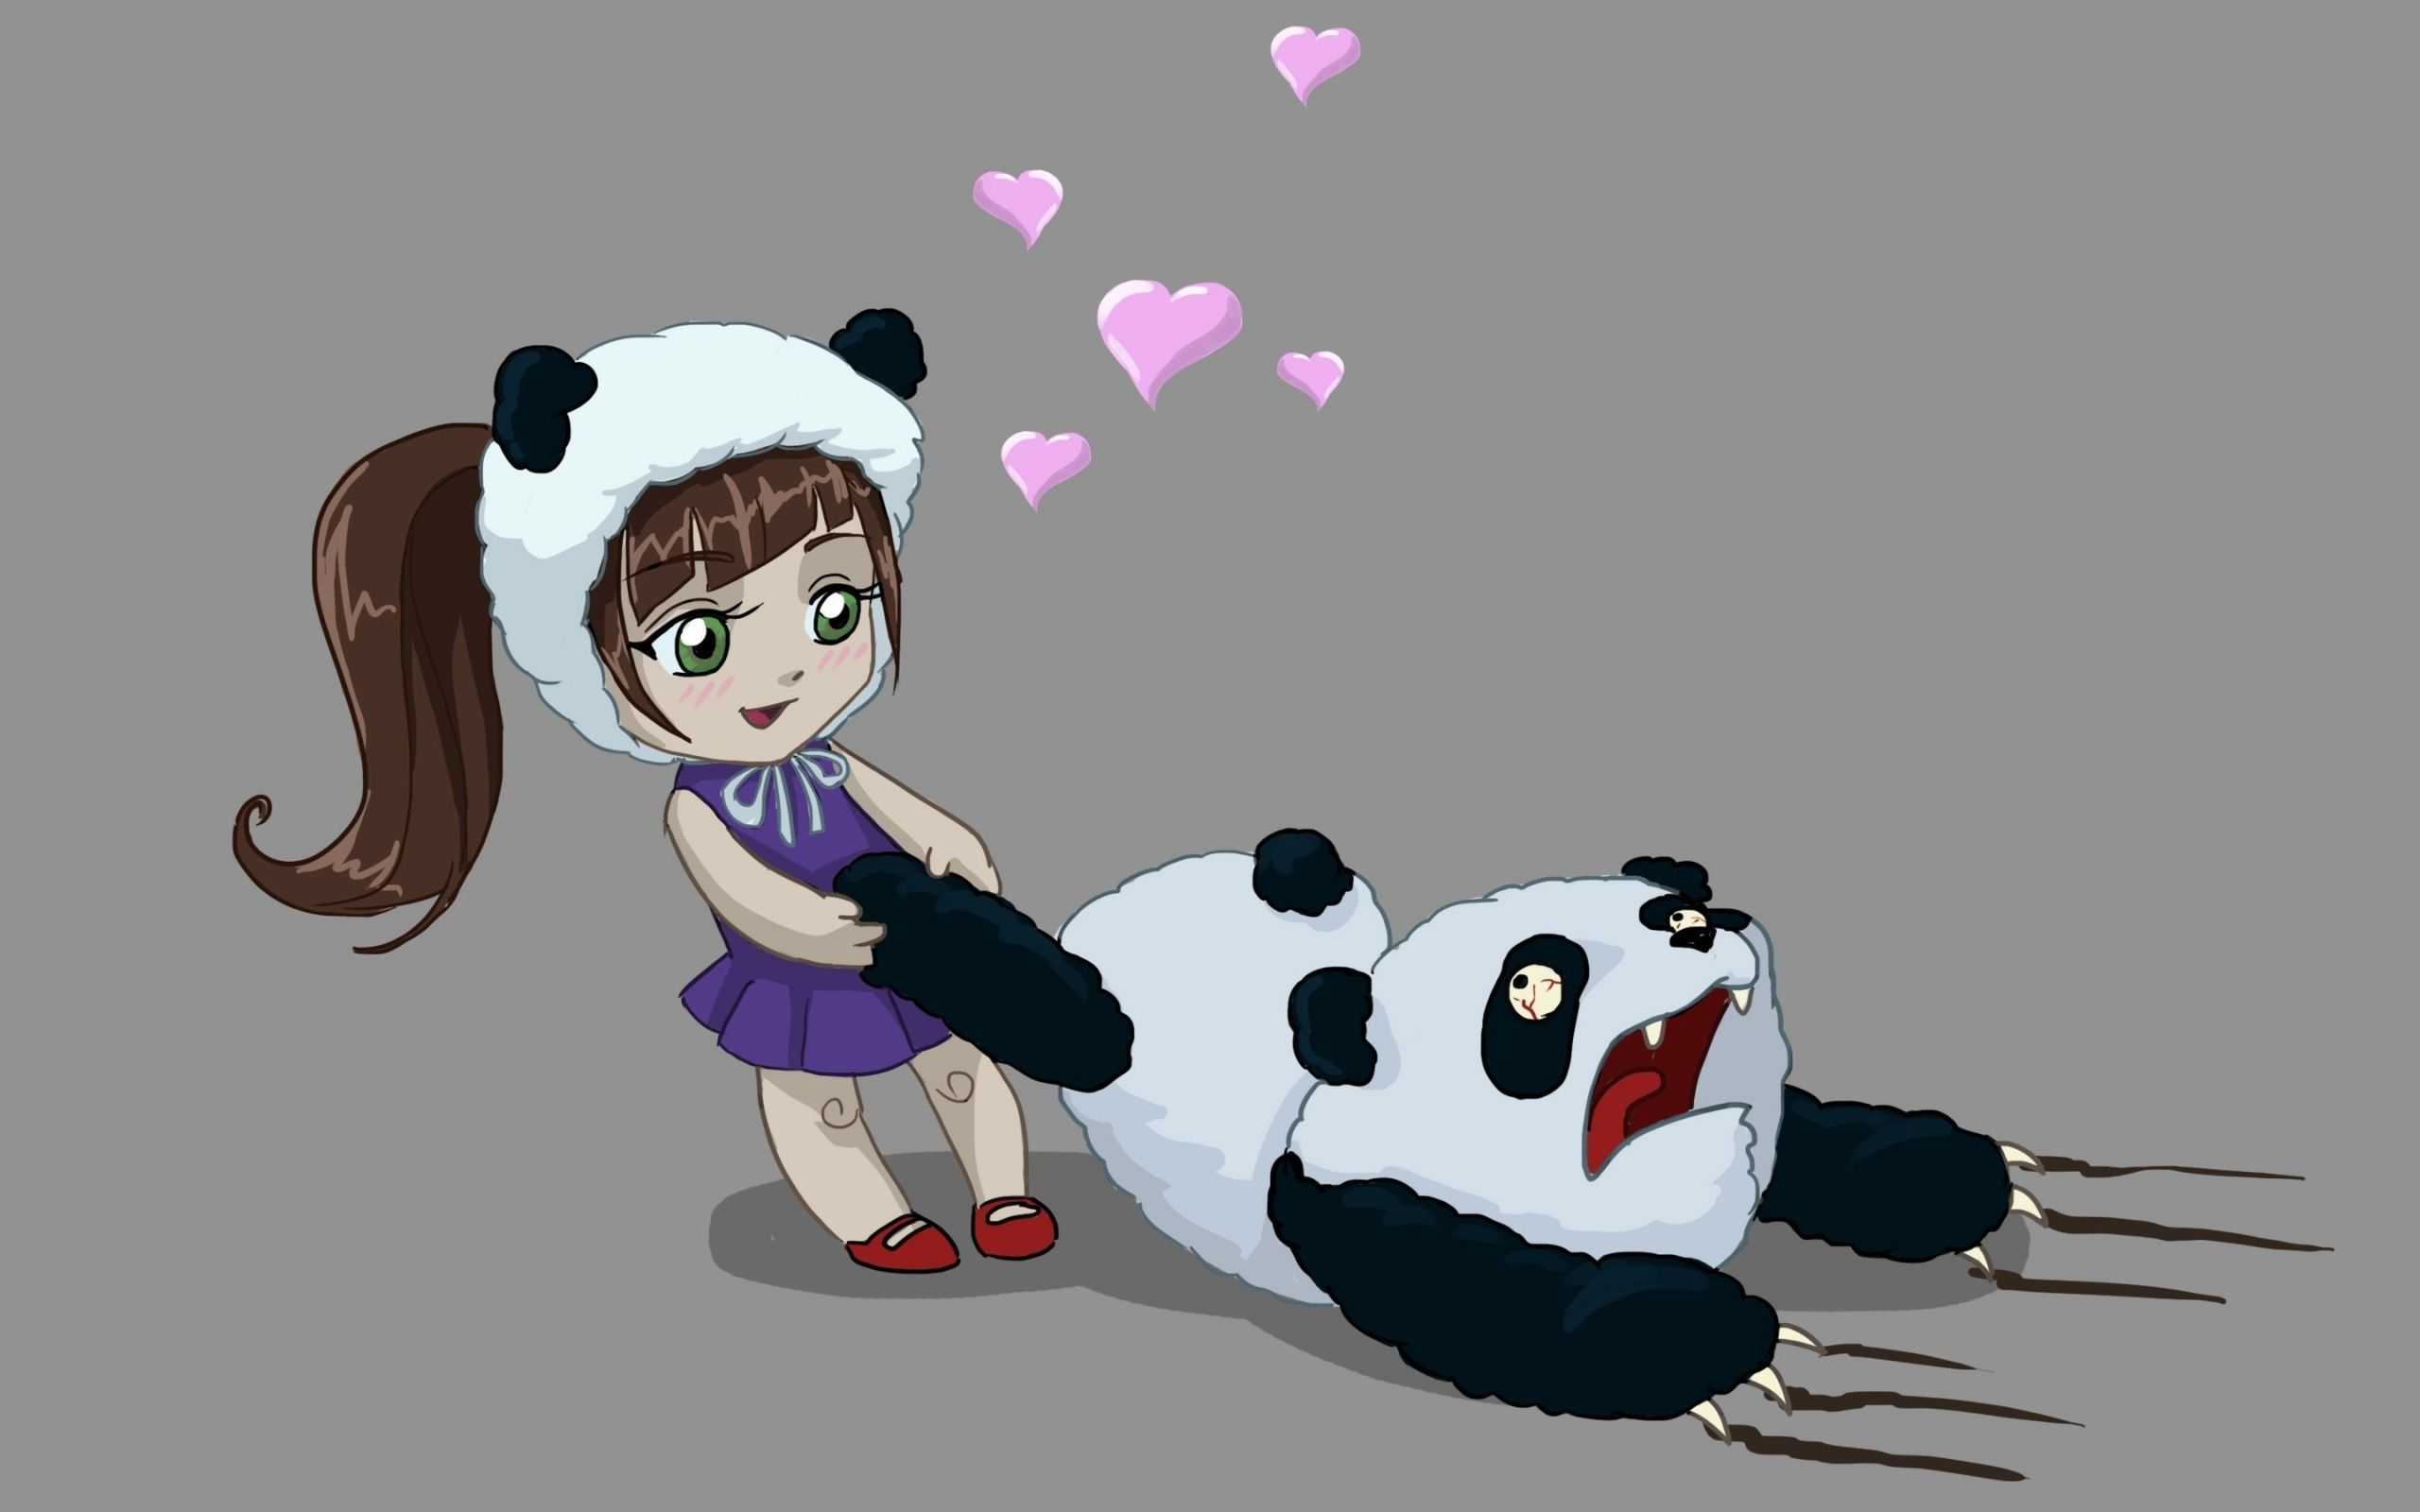 Kawaii Panda Girl Wallpapers - Top Free Kawaii Panda Girl